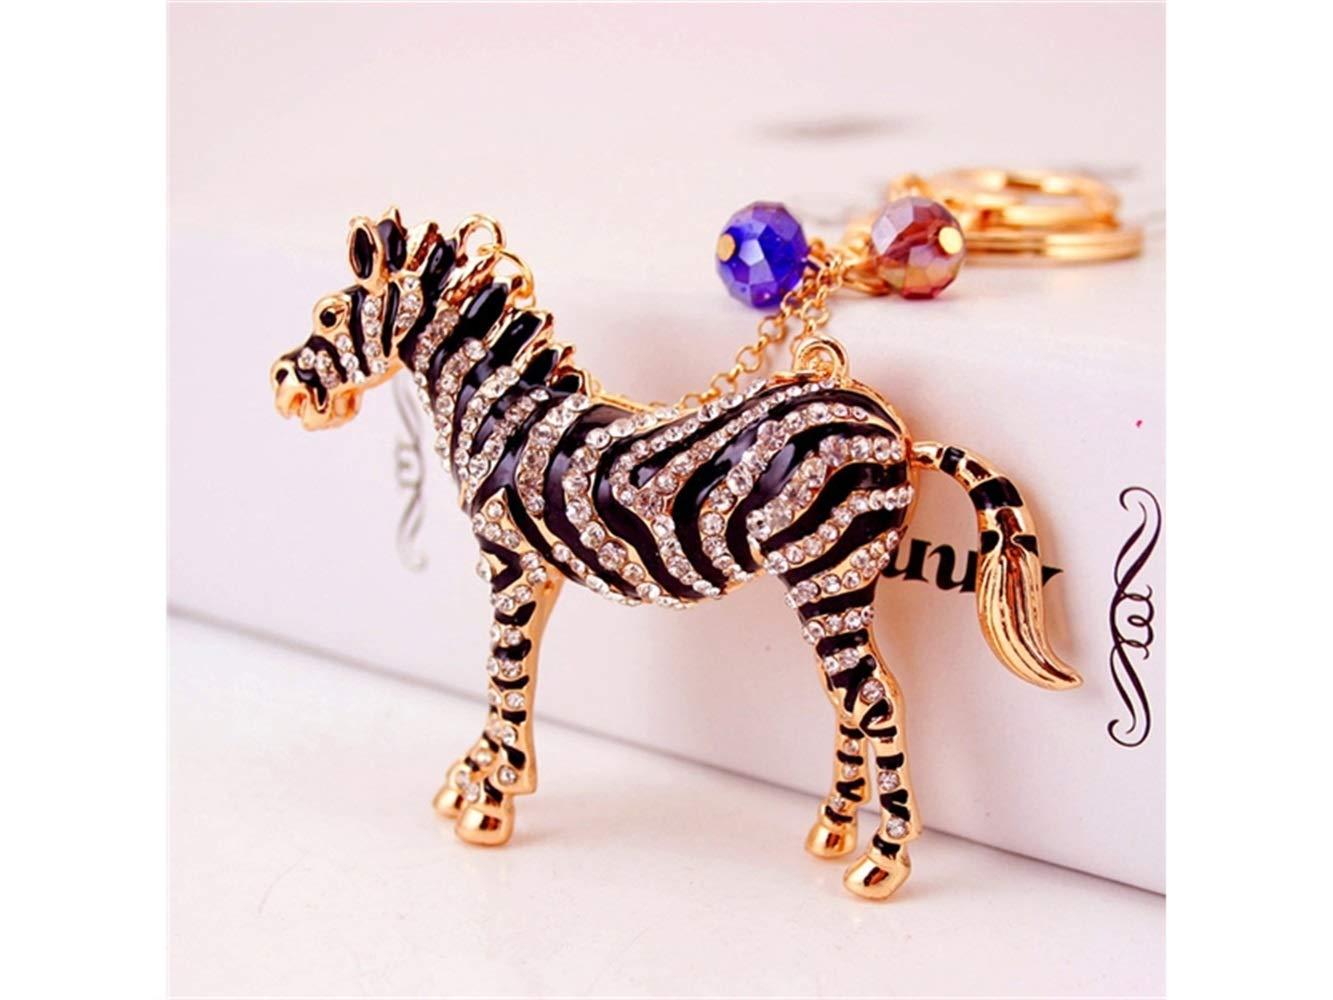 Special Cute Exquisite Zebra Keychain Animal Key Trinket Car Bag Key Holder Decorations(Black) Bag Pendant